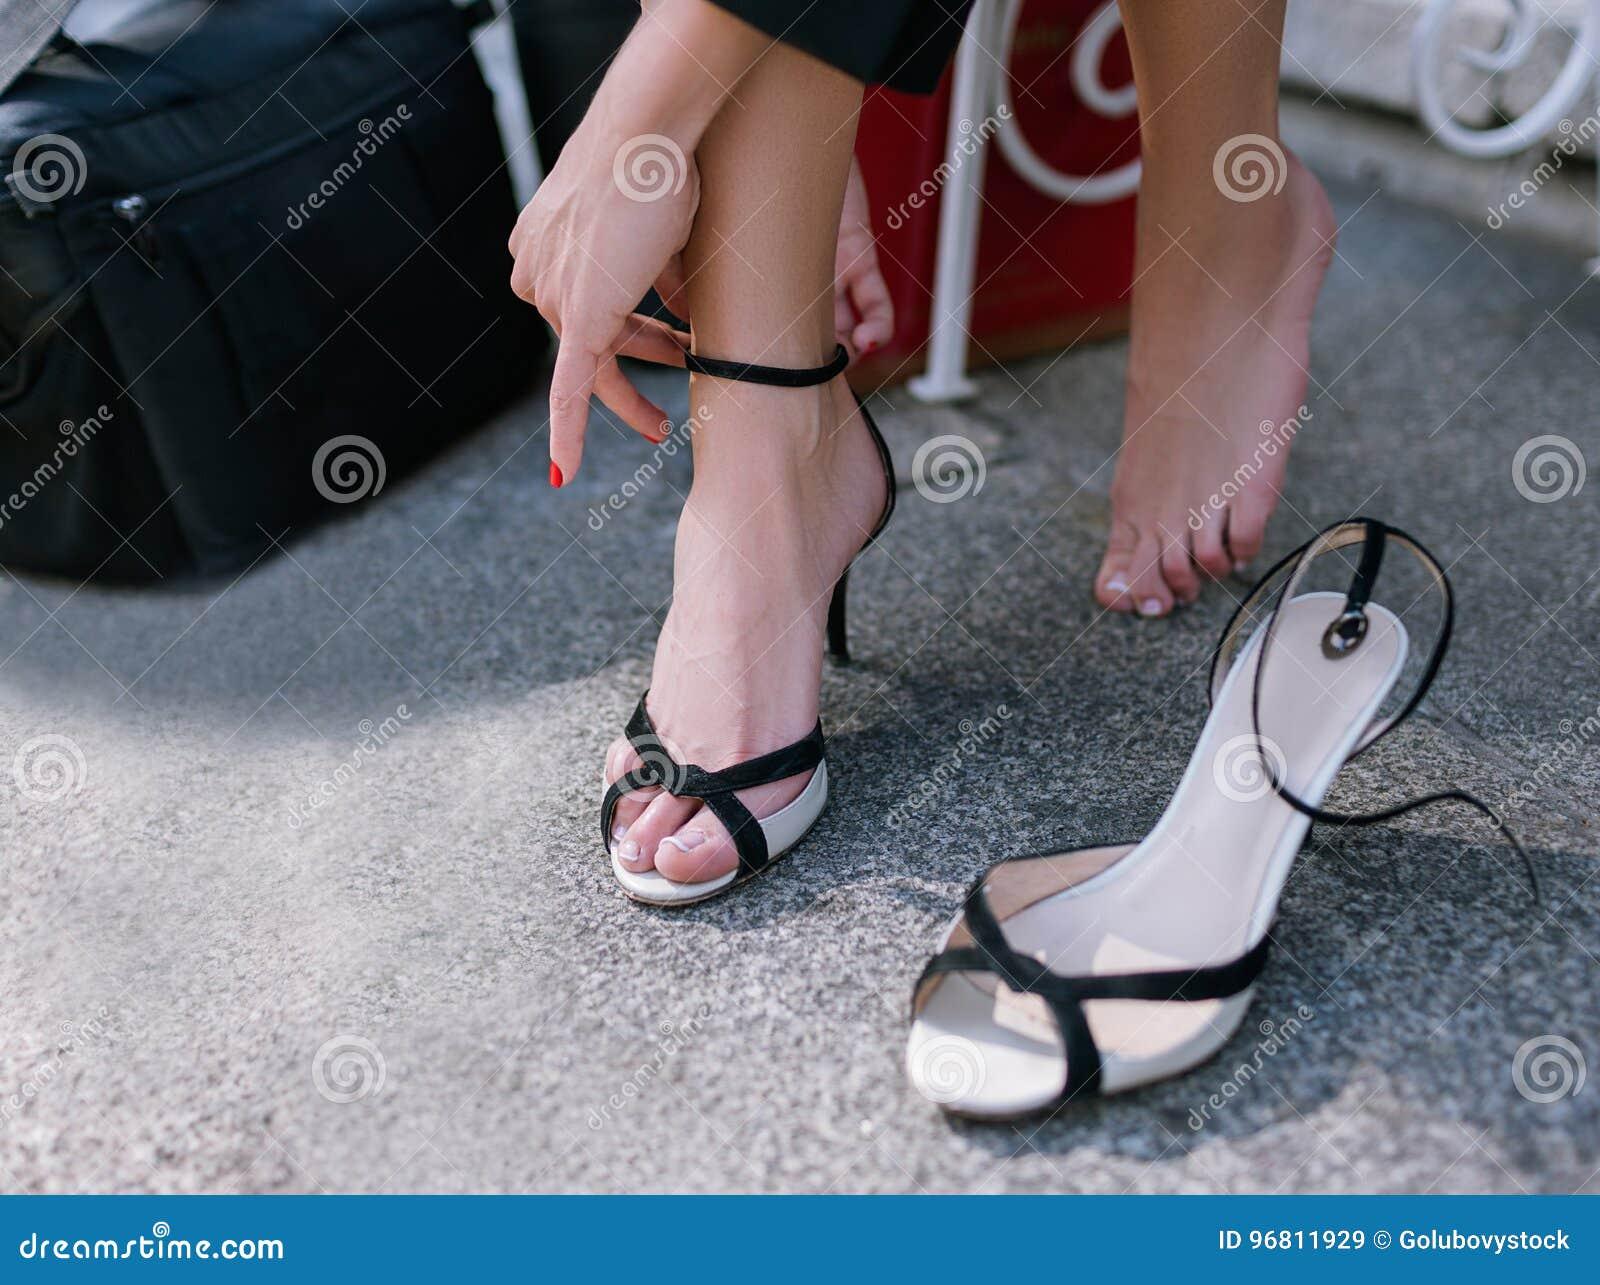 https://thumbs.dreamstime.com/z/barefoot-woman-s-tired-legs-closeup-modern-social-behavior-confident-uninhibited-girl-taking-off-her-shoes-96811929.jpg